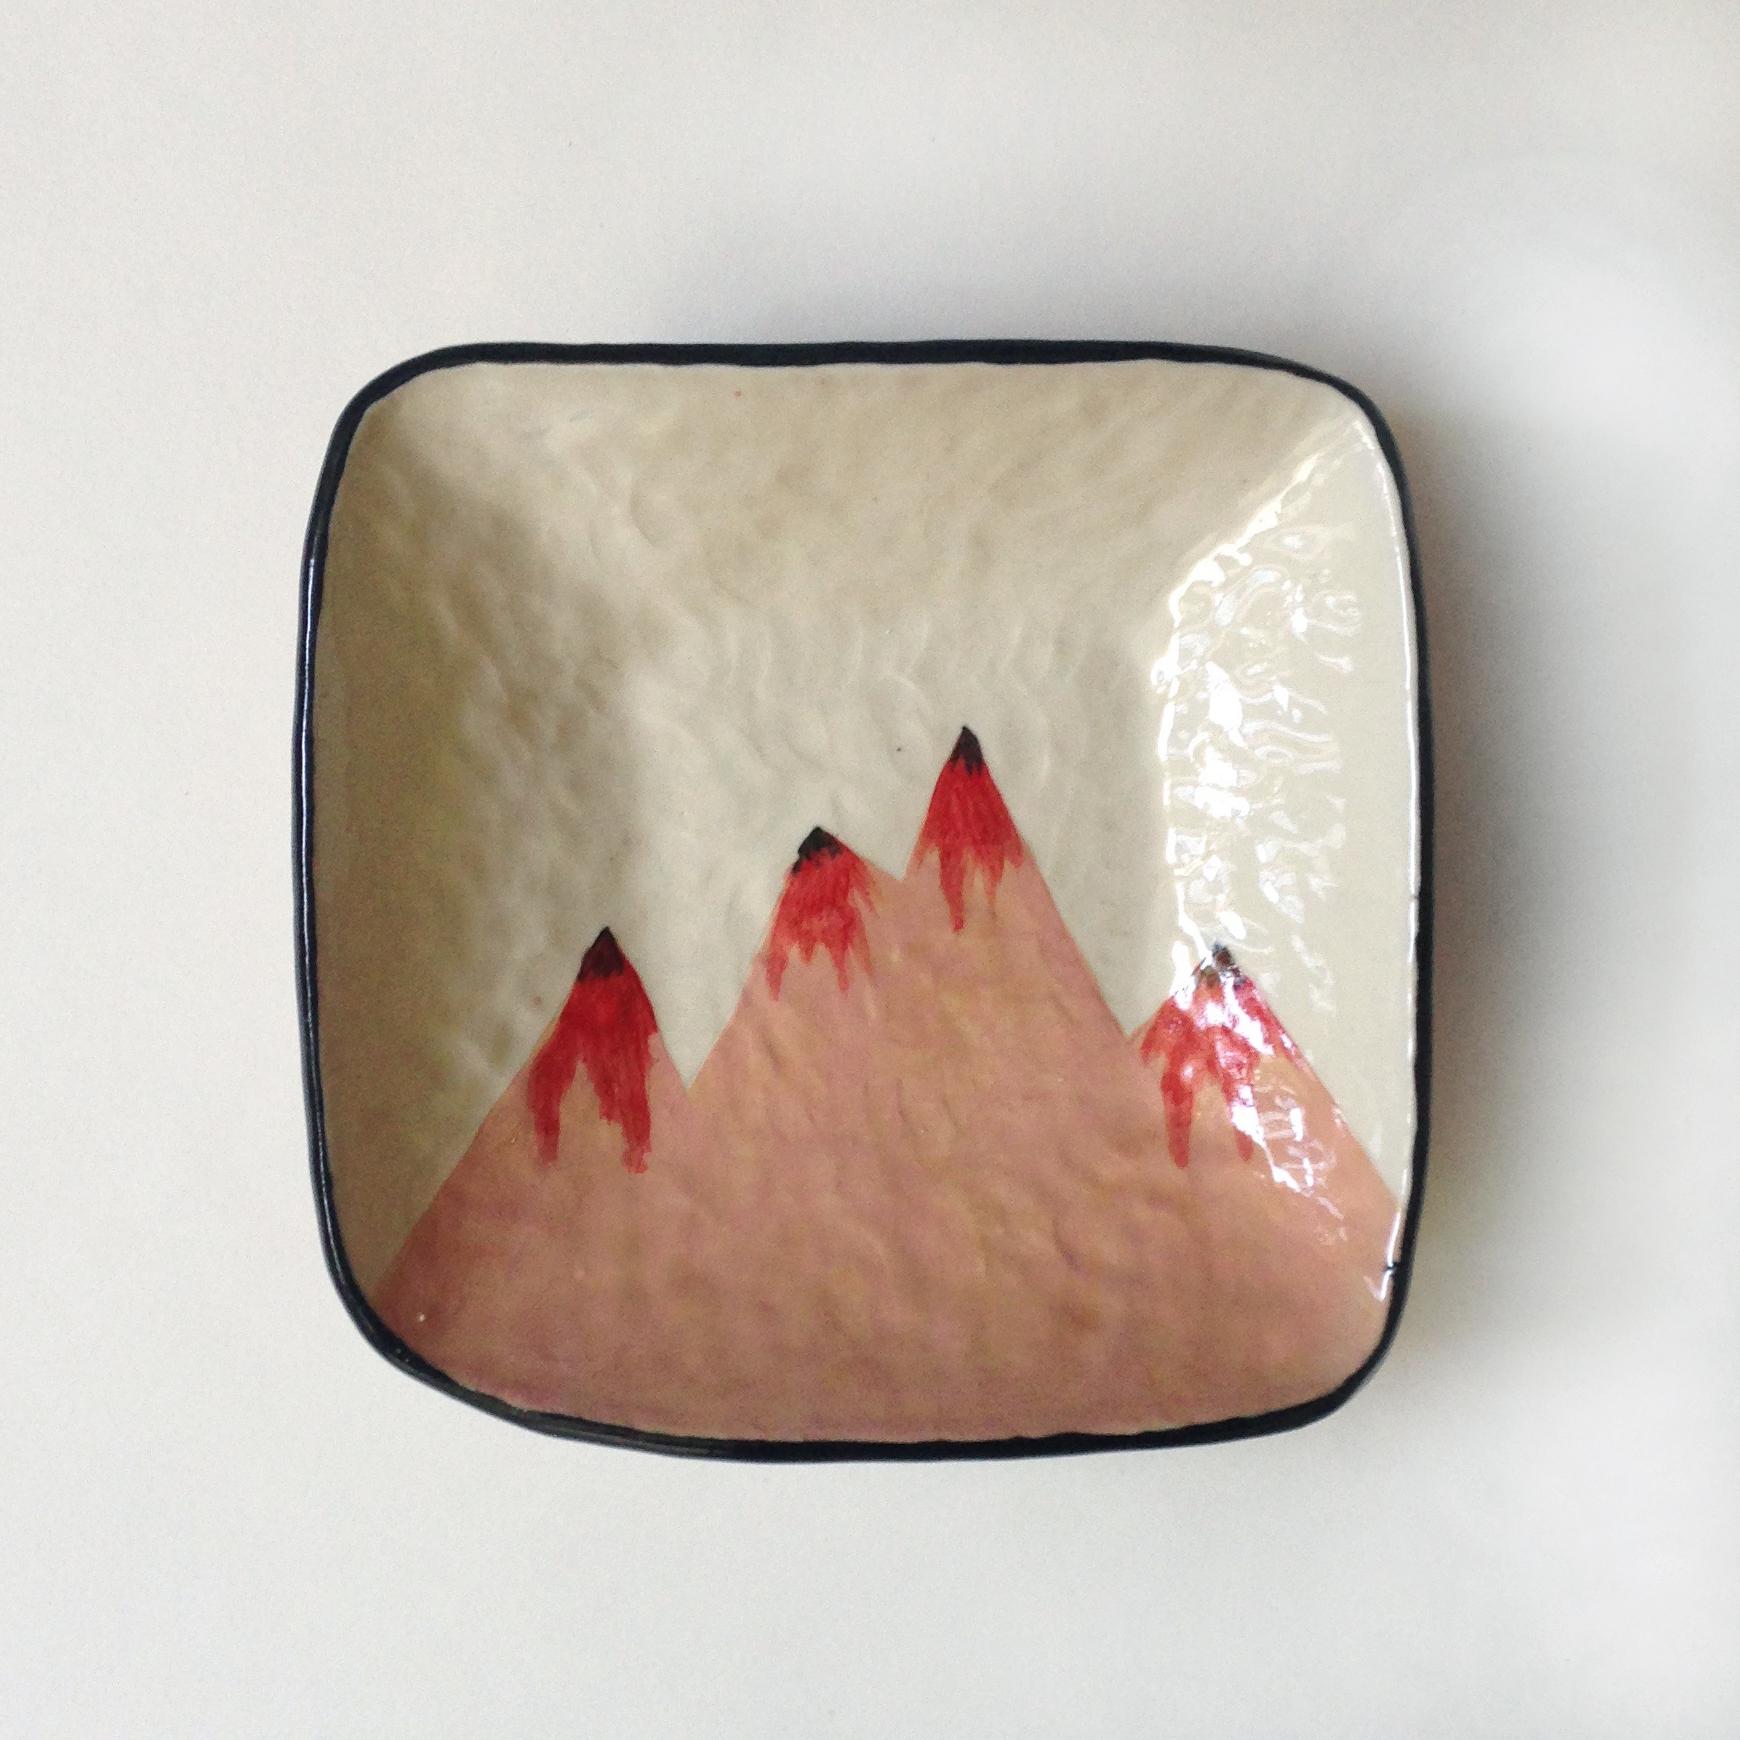 Square mountain dish